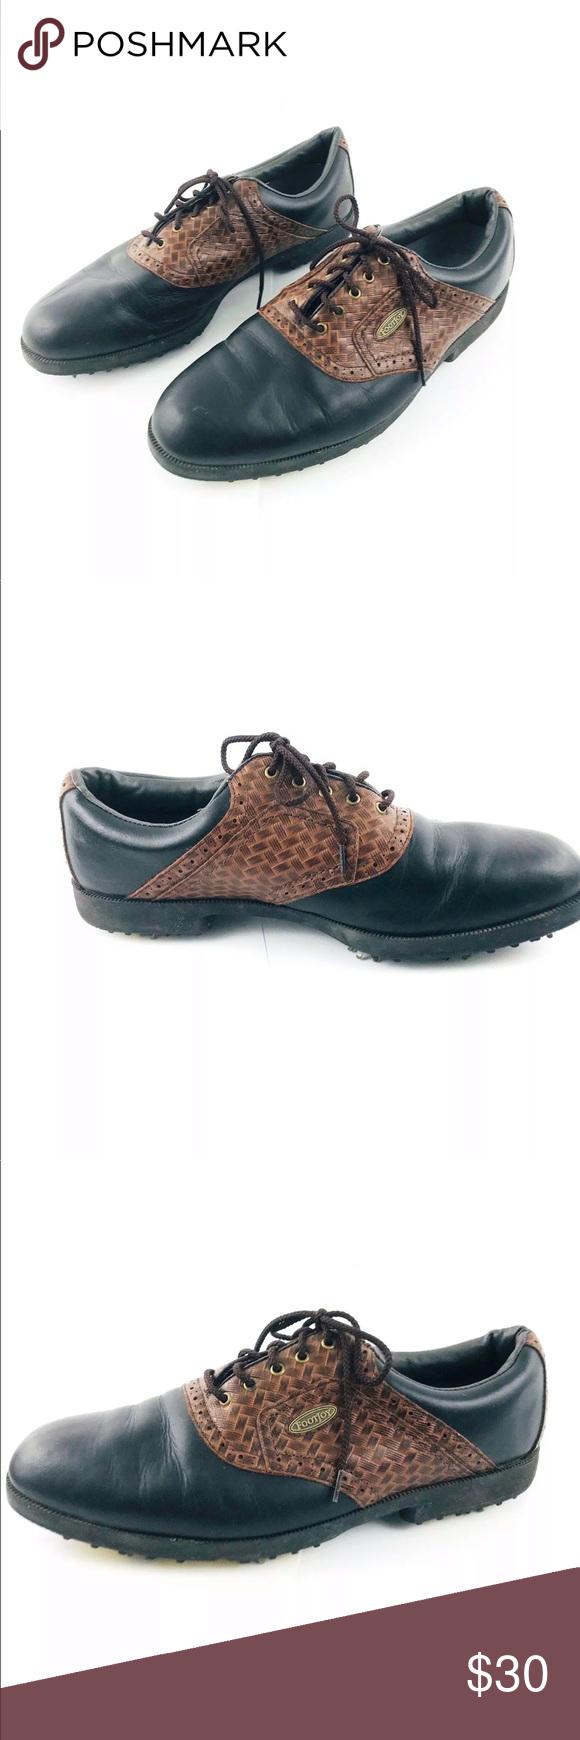 Footjoy Softjoy Terrain Mens Golf Shoes Soft Spike Footjoy Men S Golf Shoes Men S Tag Size 12m Soft Joys Terrain 5 Dress Shoes Men Golf Shoes Mens Mens Golf [ 1740 x 580 Pixel ]